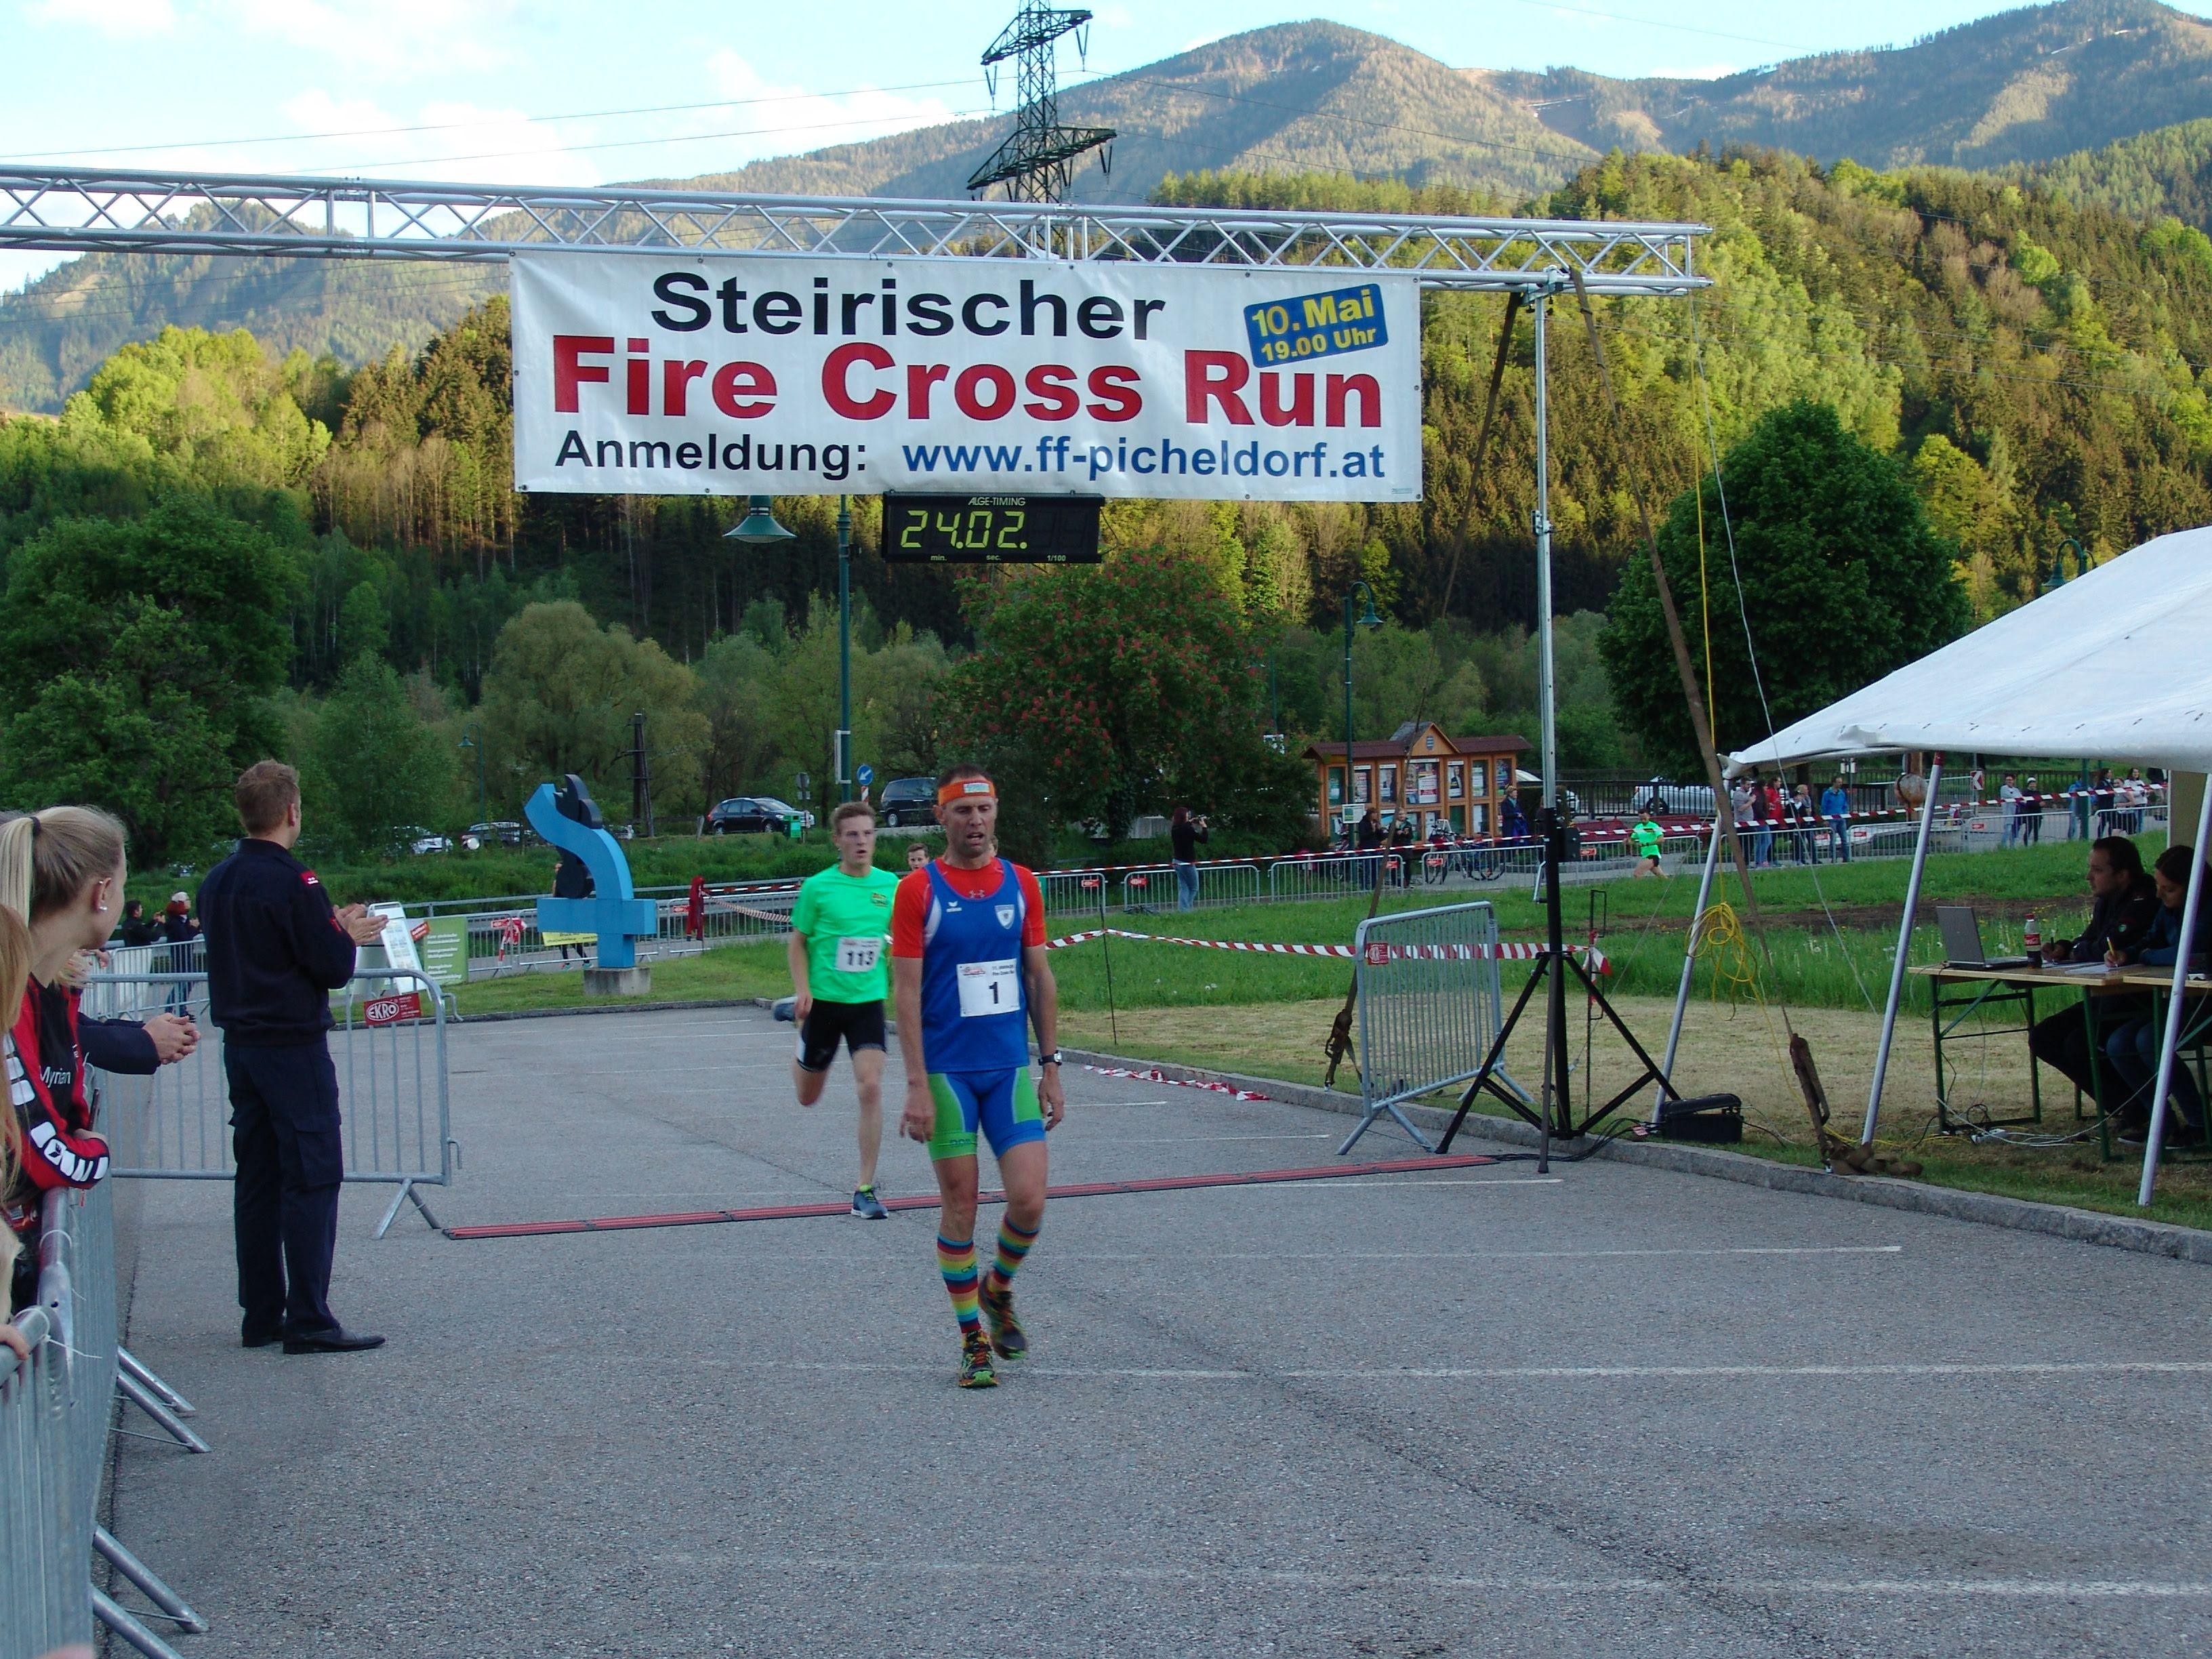 Fire Cross Run - Zieleinlauf Clemens